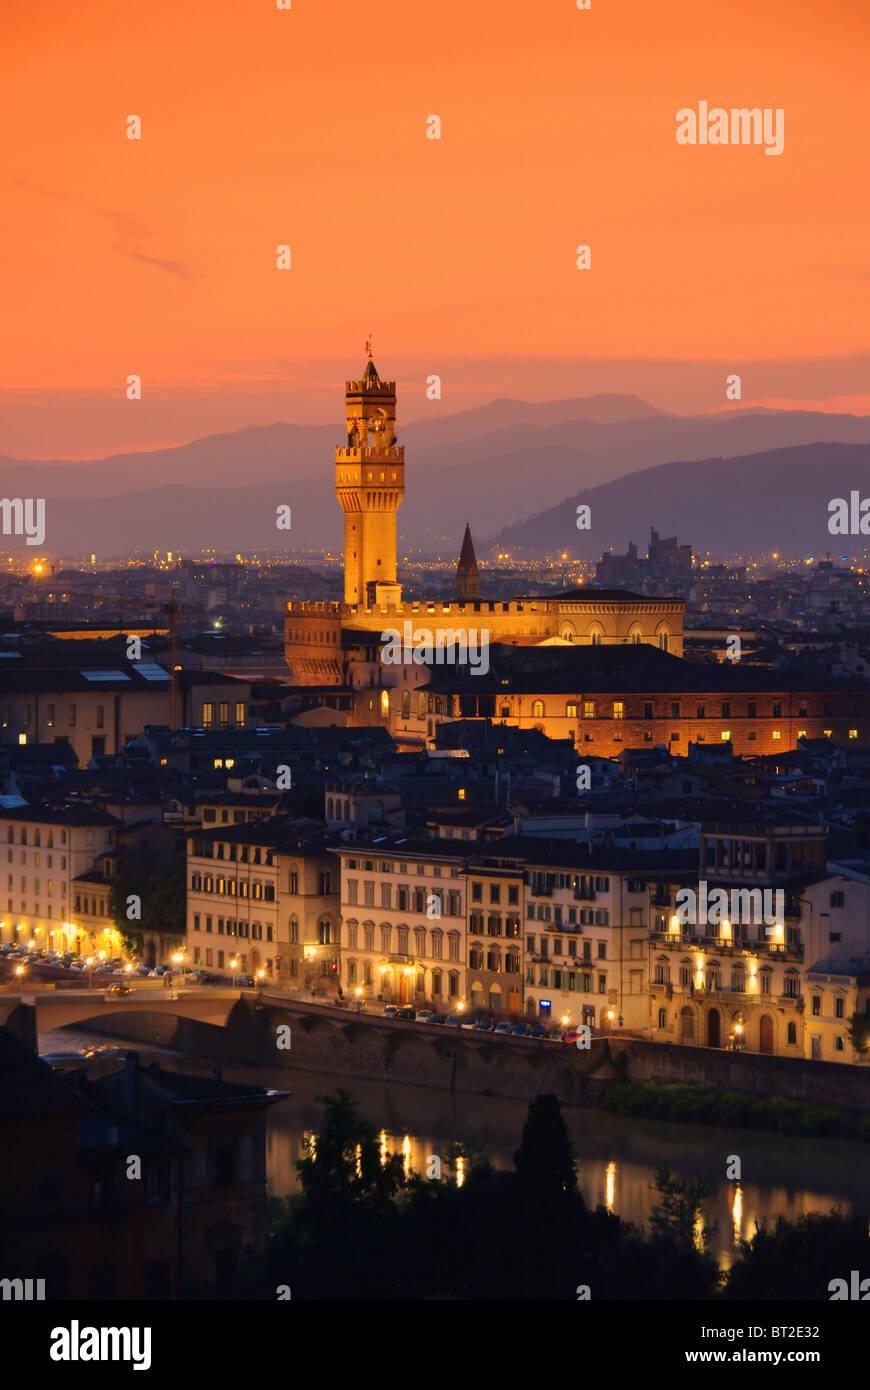 Florenz Palazzo Vecchio Abend - Florence Palazzo Vecchio evening 01 - Stock Image